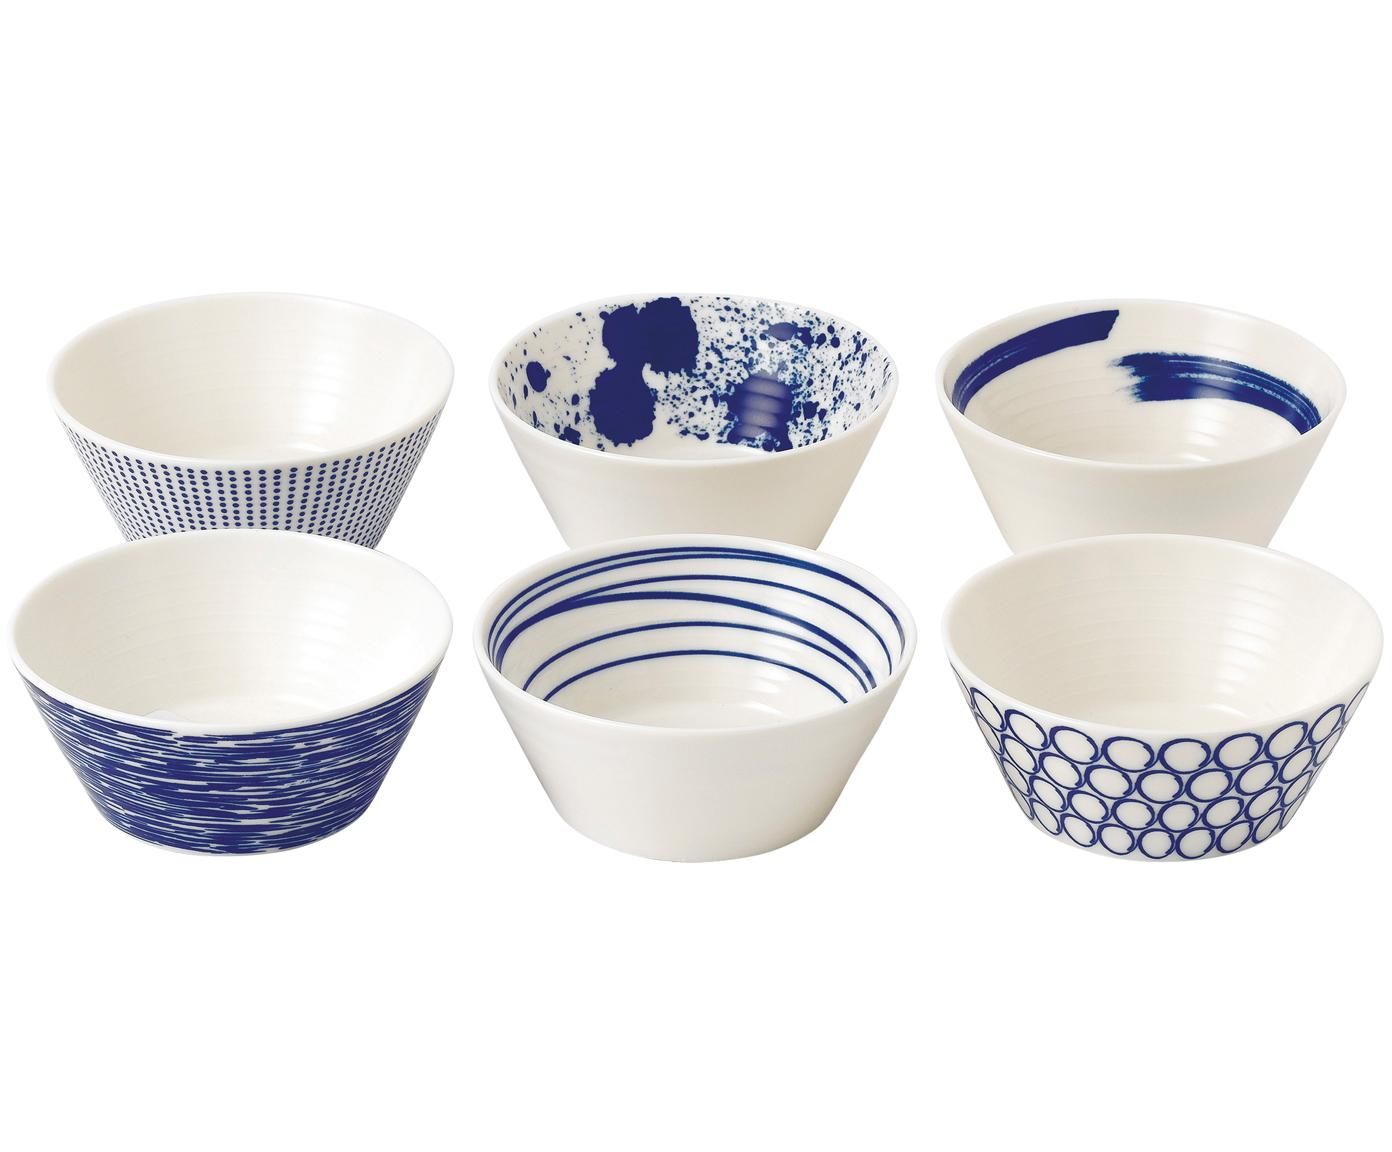 Set 6 ciotole in porcellana Pacific, Porcellana, Bianco, blu, Ø 11 cm